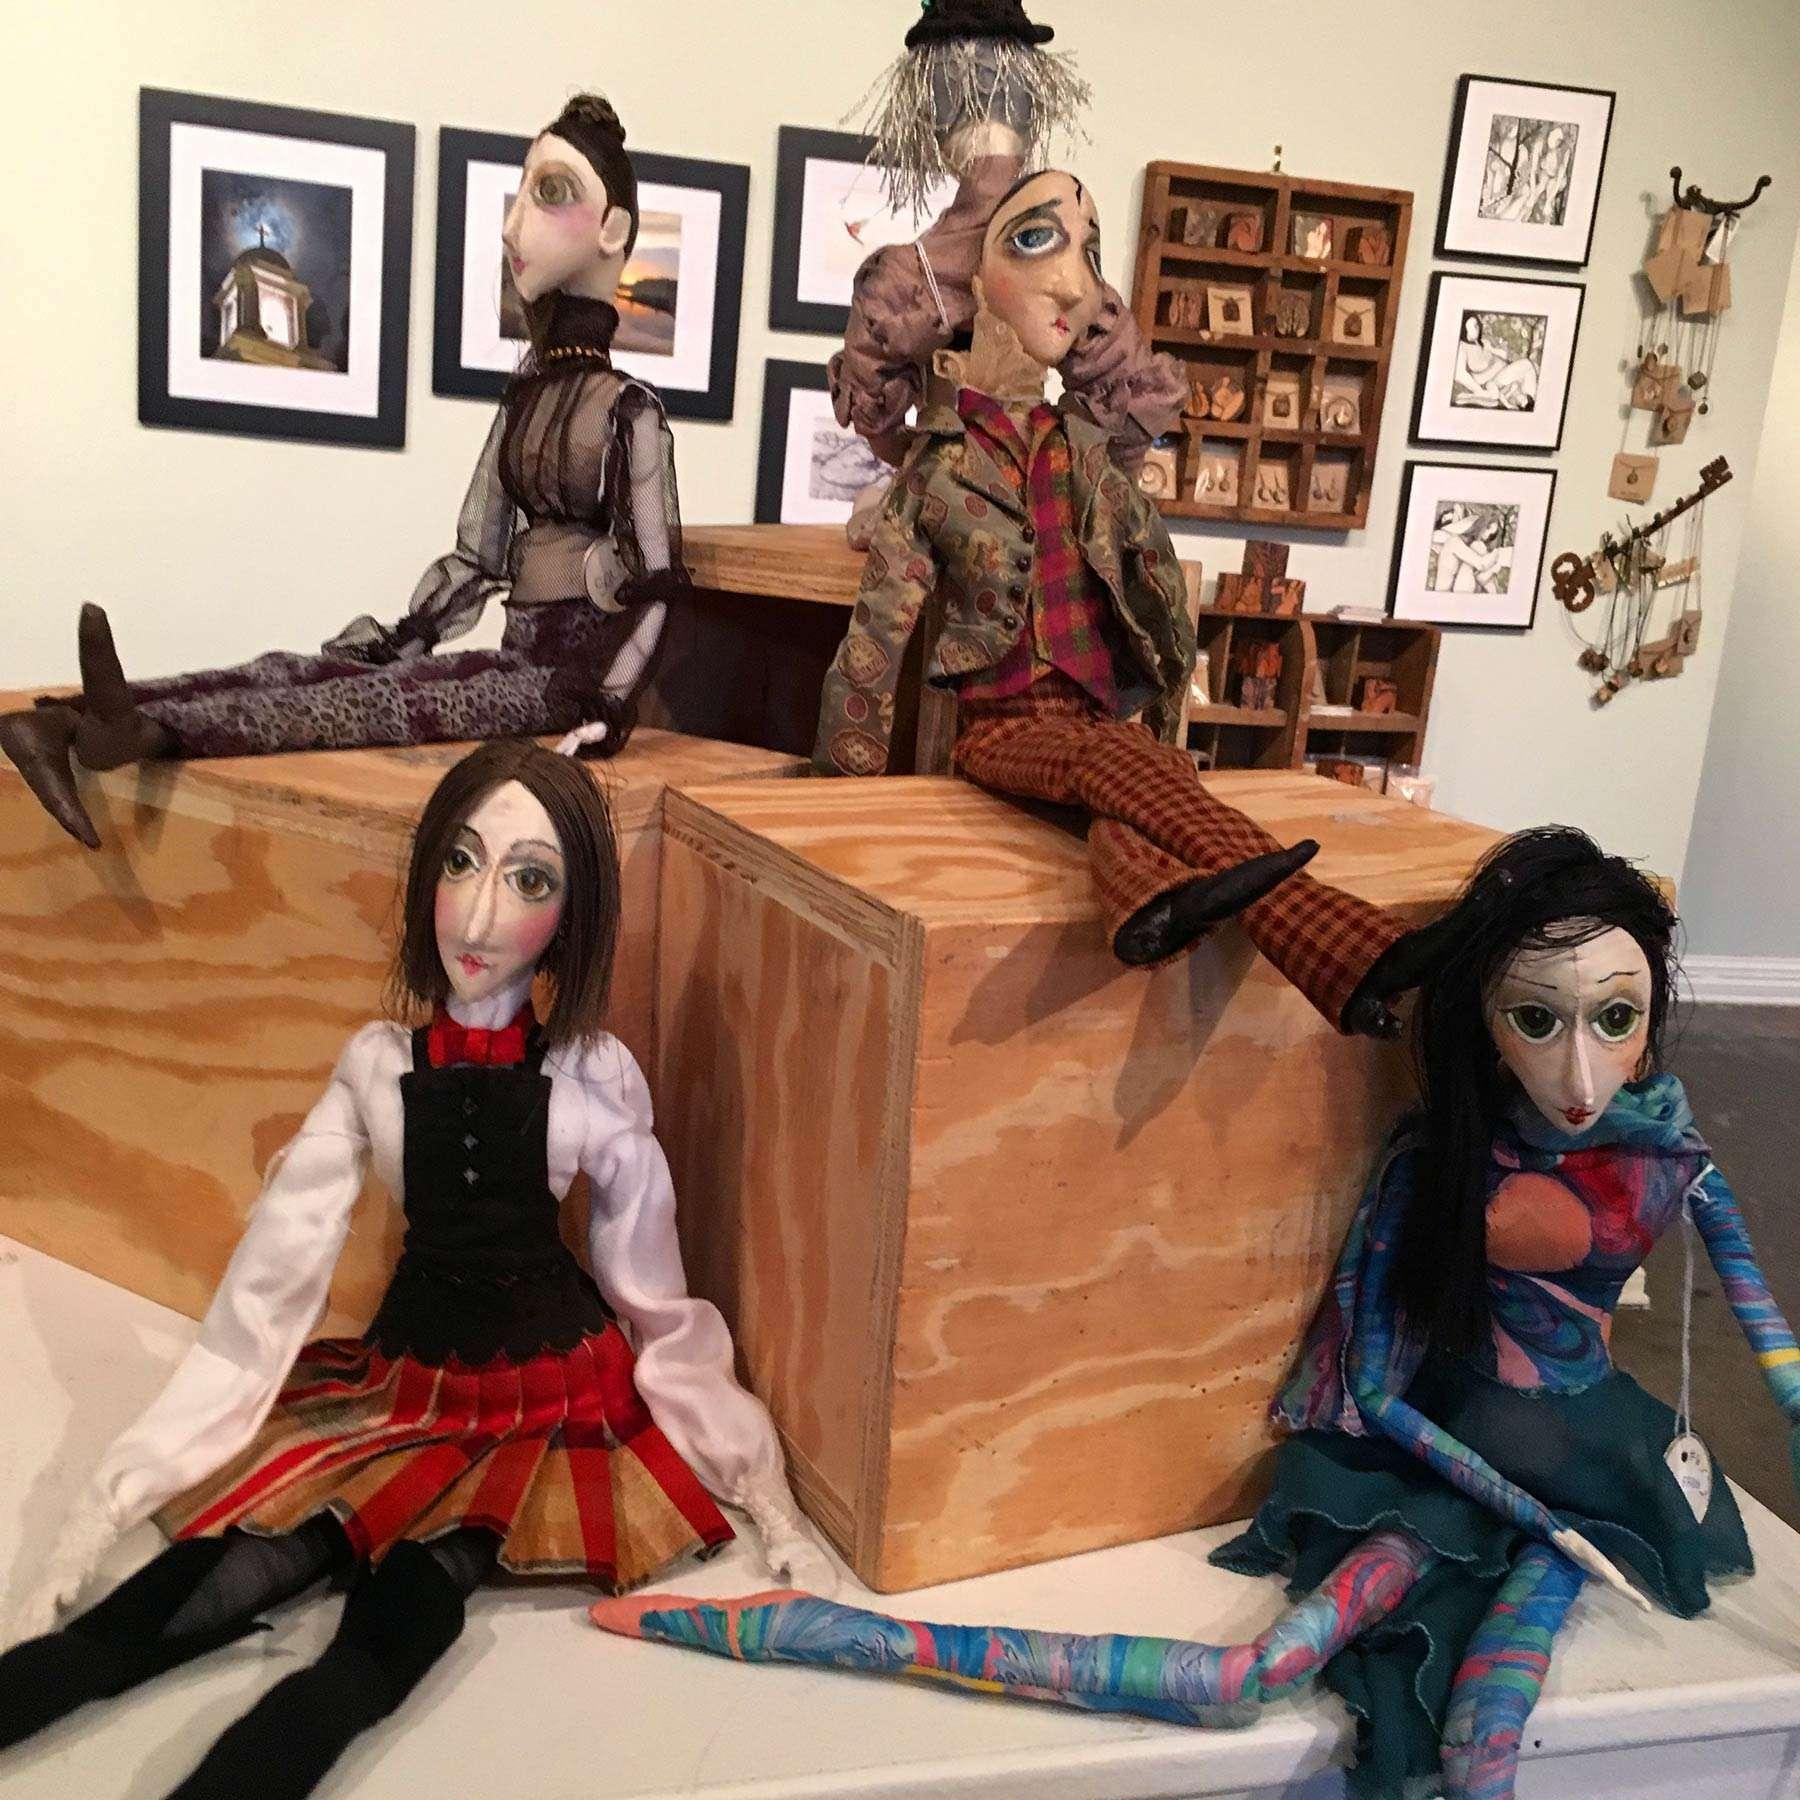 Affordable Art Show - Cricket Dolls